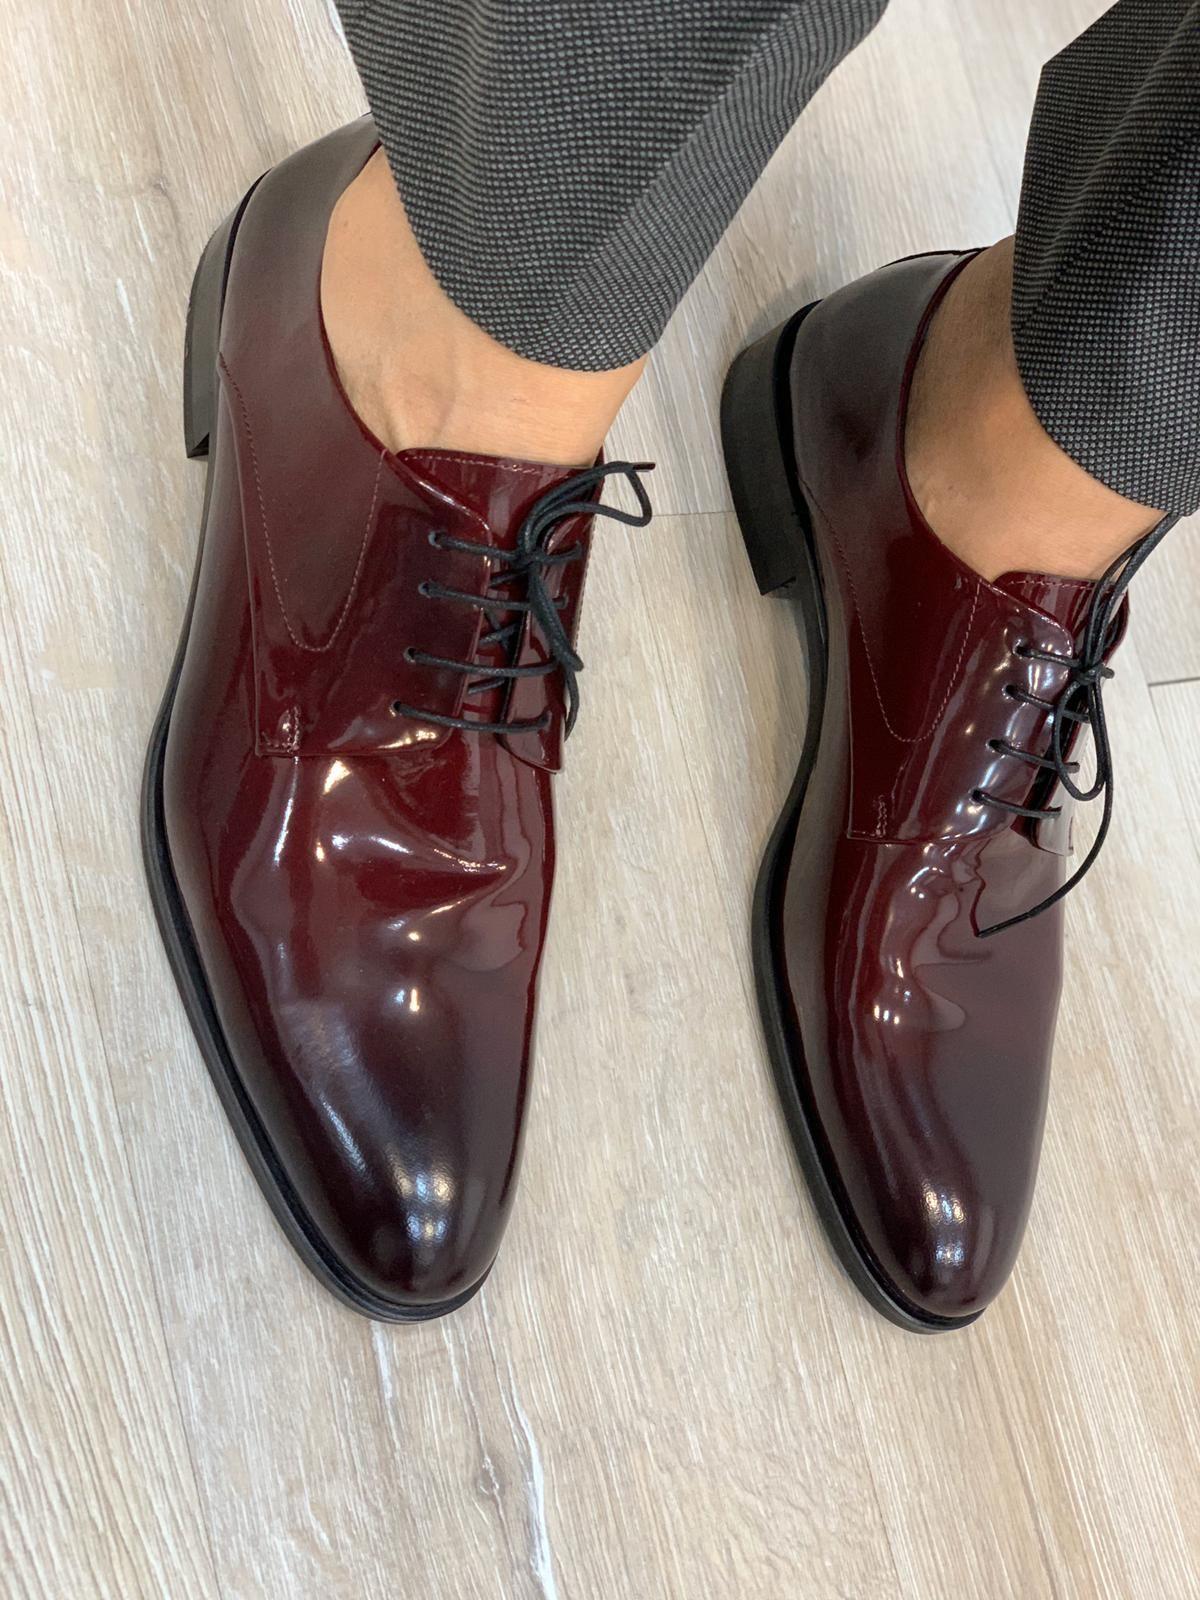 PATENT BRUGUNDY LEATHER SHOES - BELT SET | Mens patent leather shoes, Dress shoes men, Burgundy